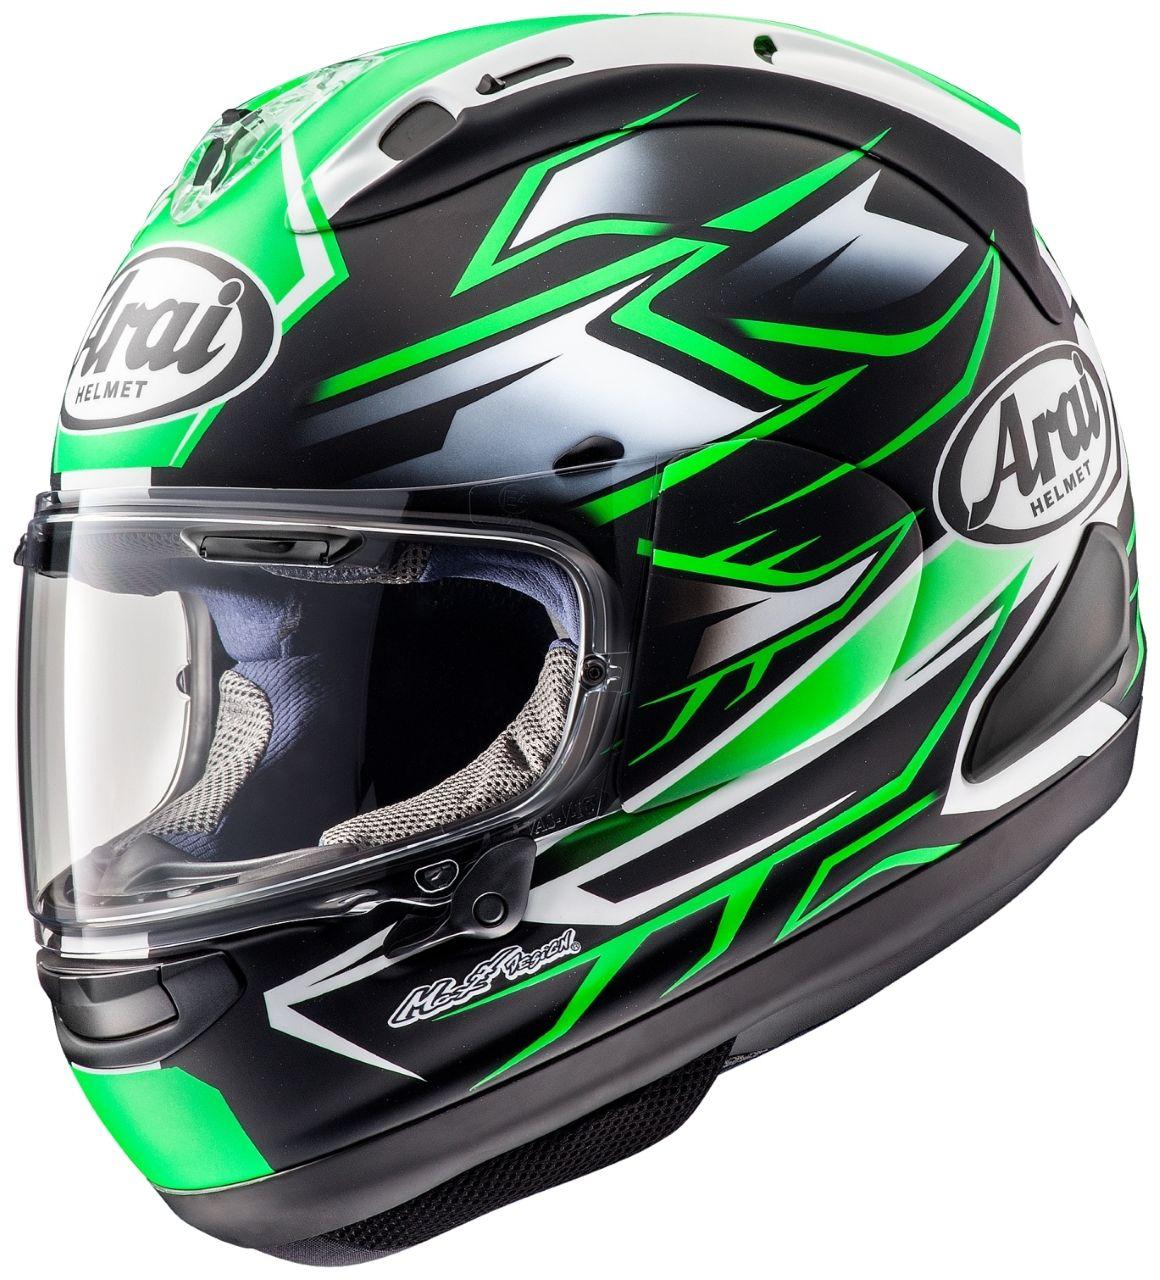 RX-7X GHOST 綠色 全罩式安全帽